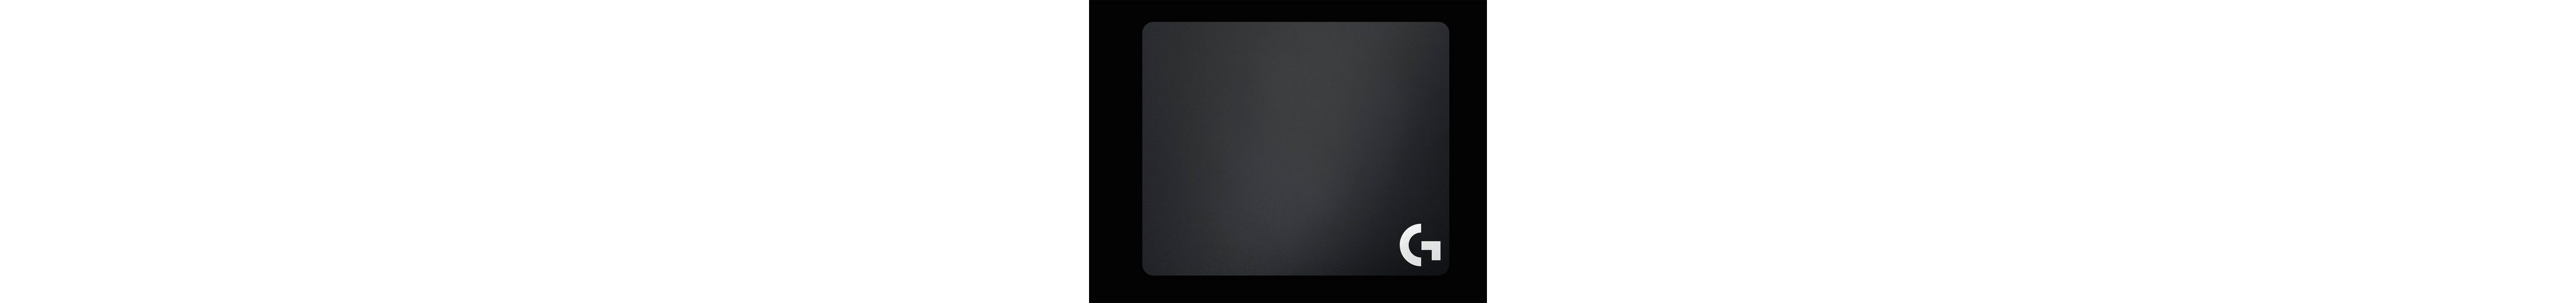 Logitech Games Gaming Pad »G240 CLOTH GAMING MOUSE PAD«